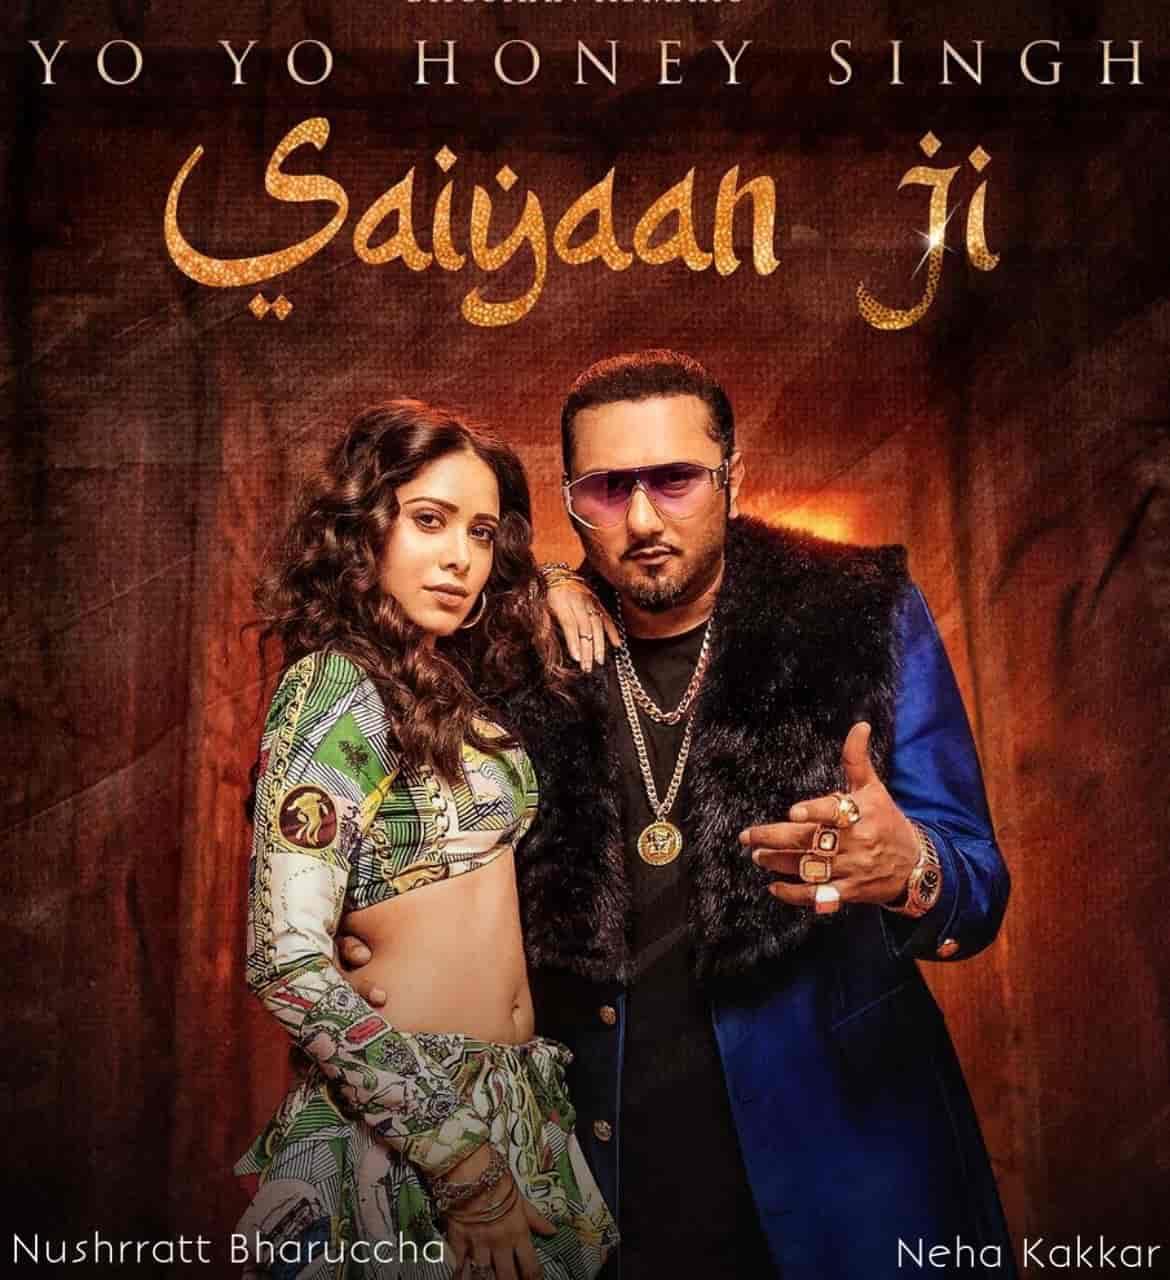 Saiyaan Ji Most Awaited Song Image Features Yo Yo Honey Singh And Neha Kakkar